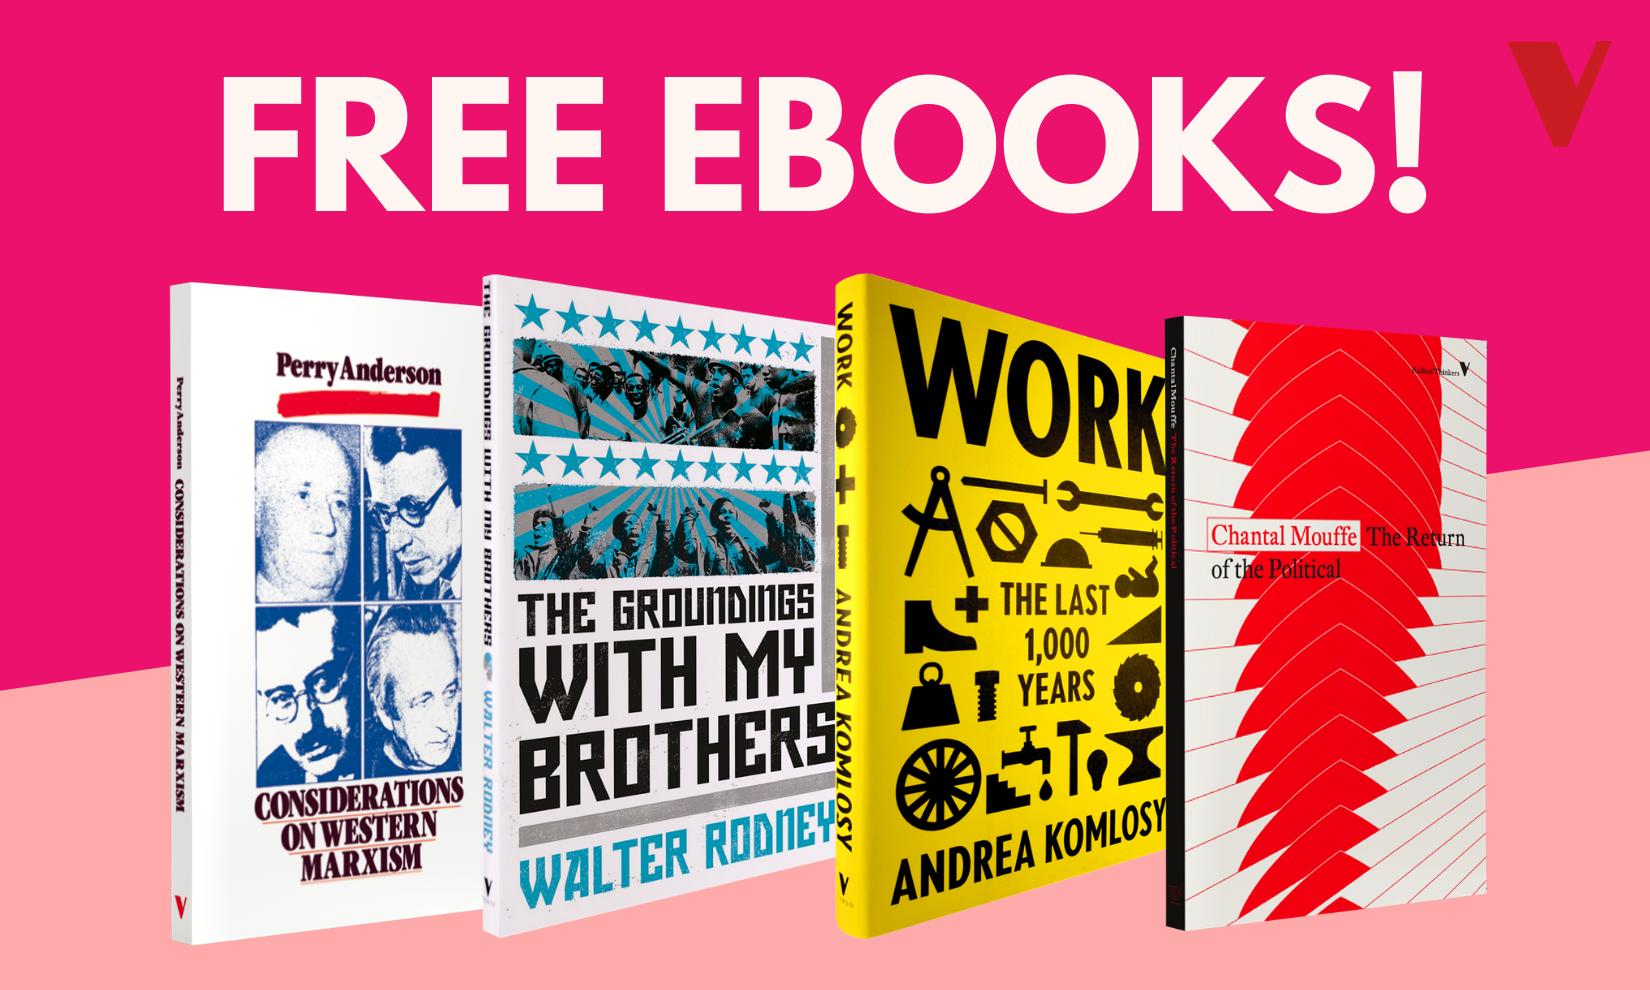 Free_ebooks-